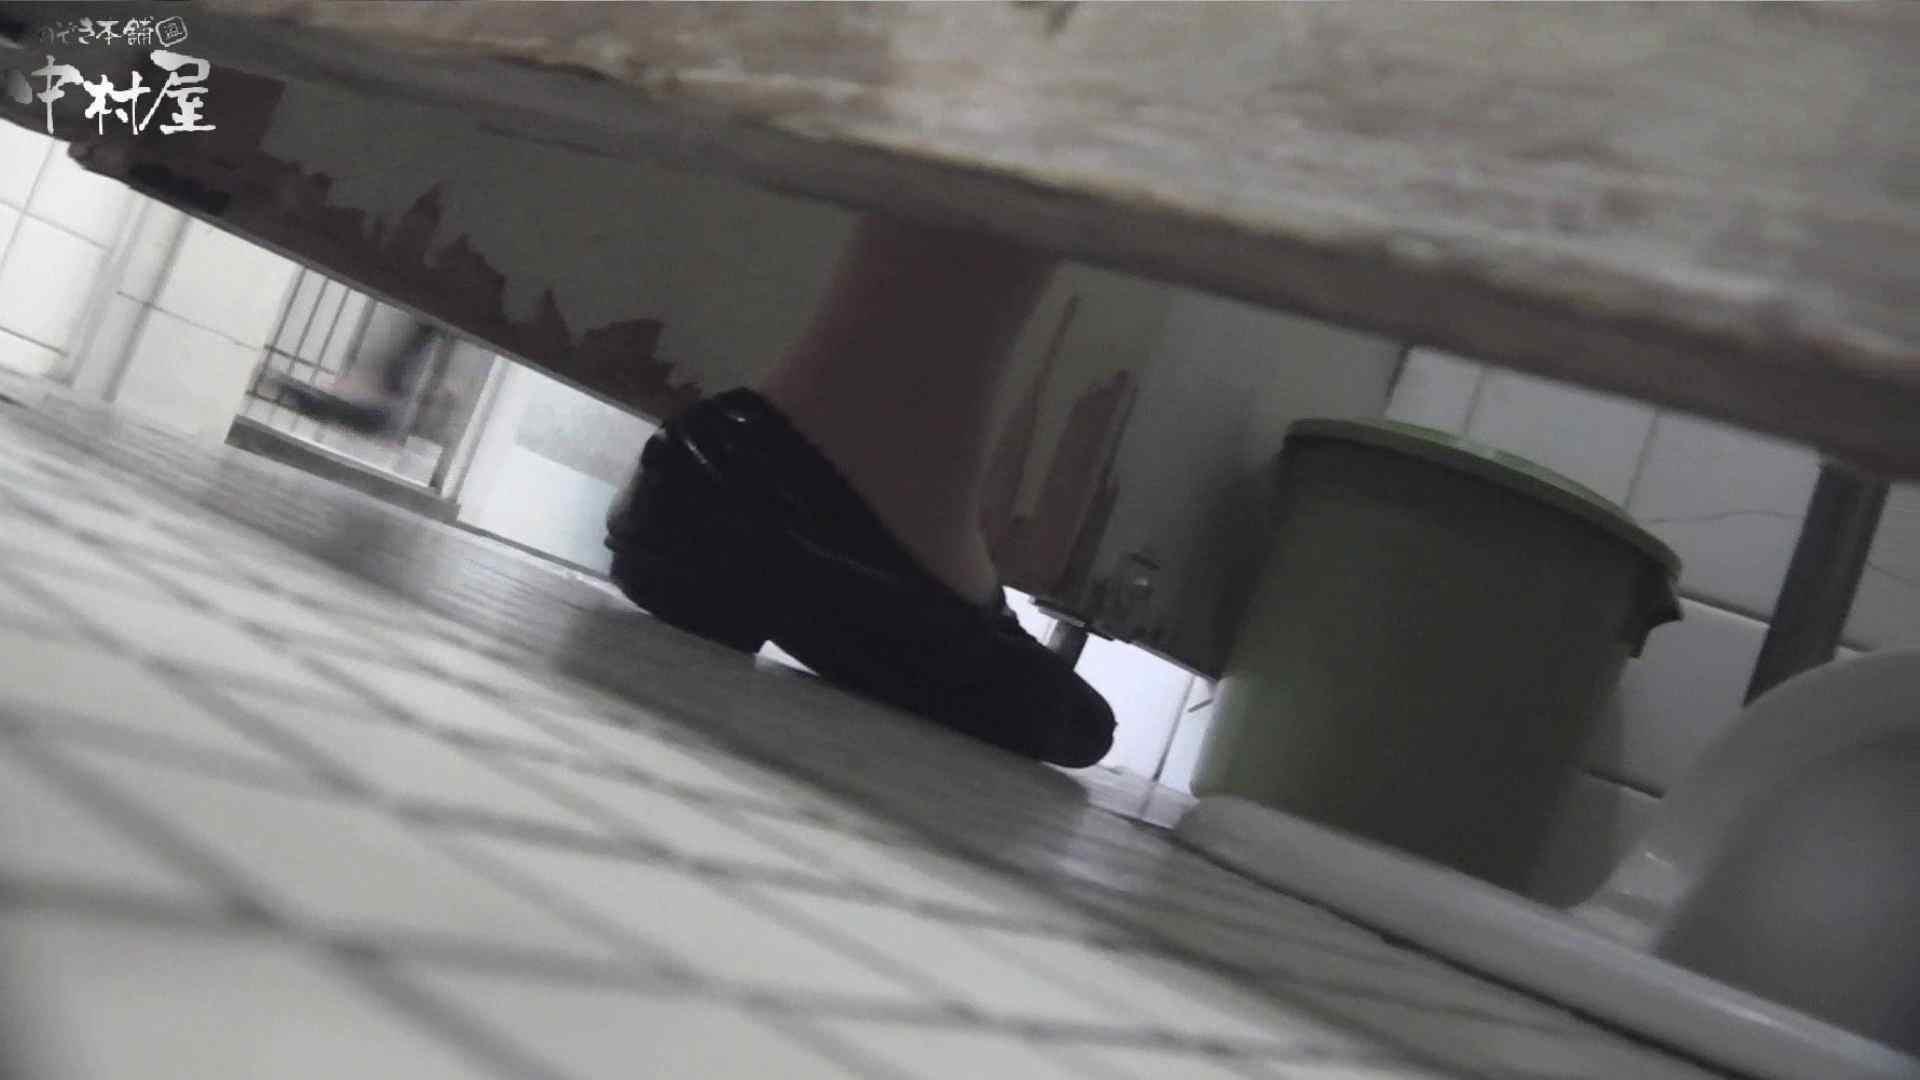 vol.42 命がけ潜伏洗面所! カカト上げながら・硬度強(太)・180g 洗面所編 のぞき動画キャプチャ 101PIX 32